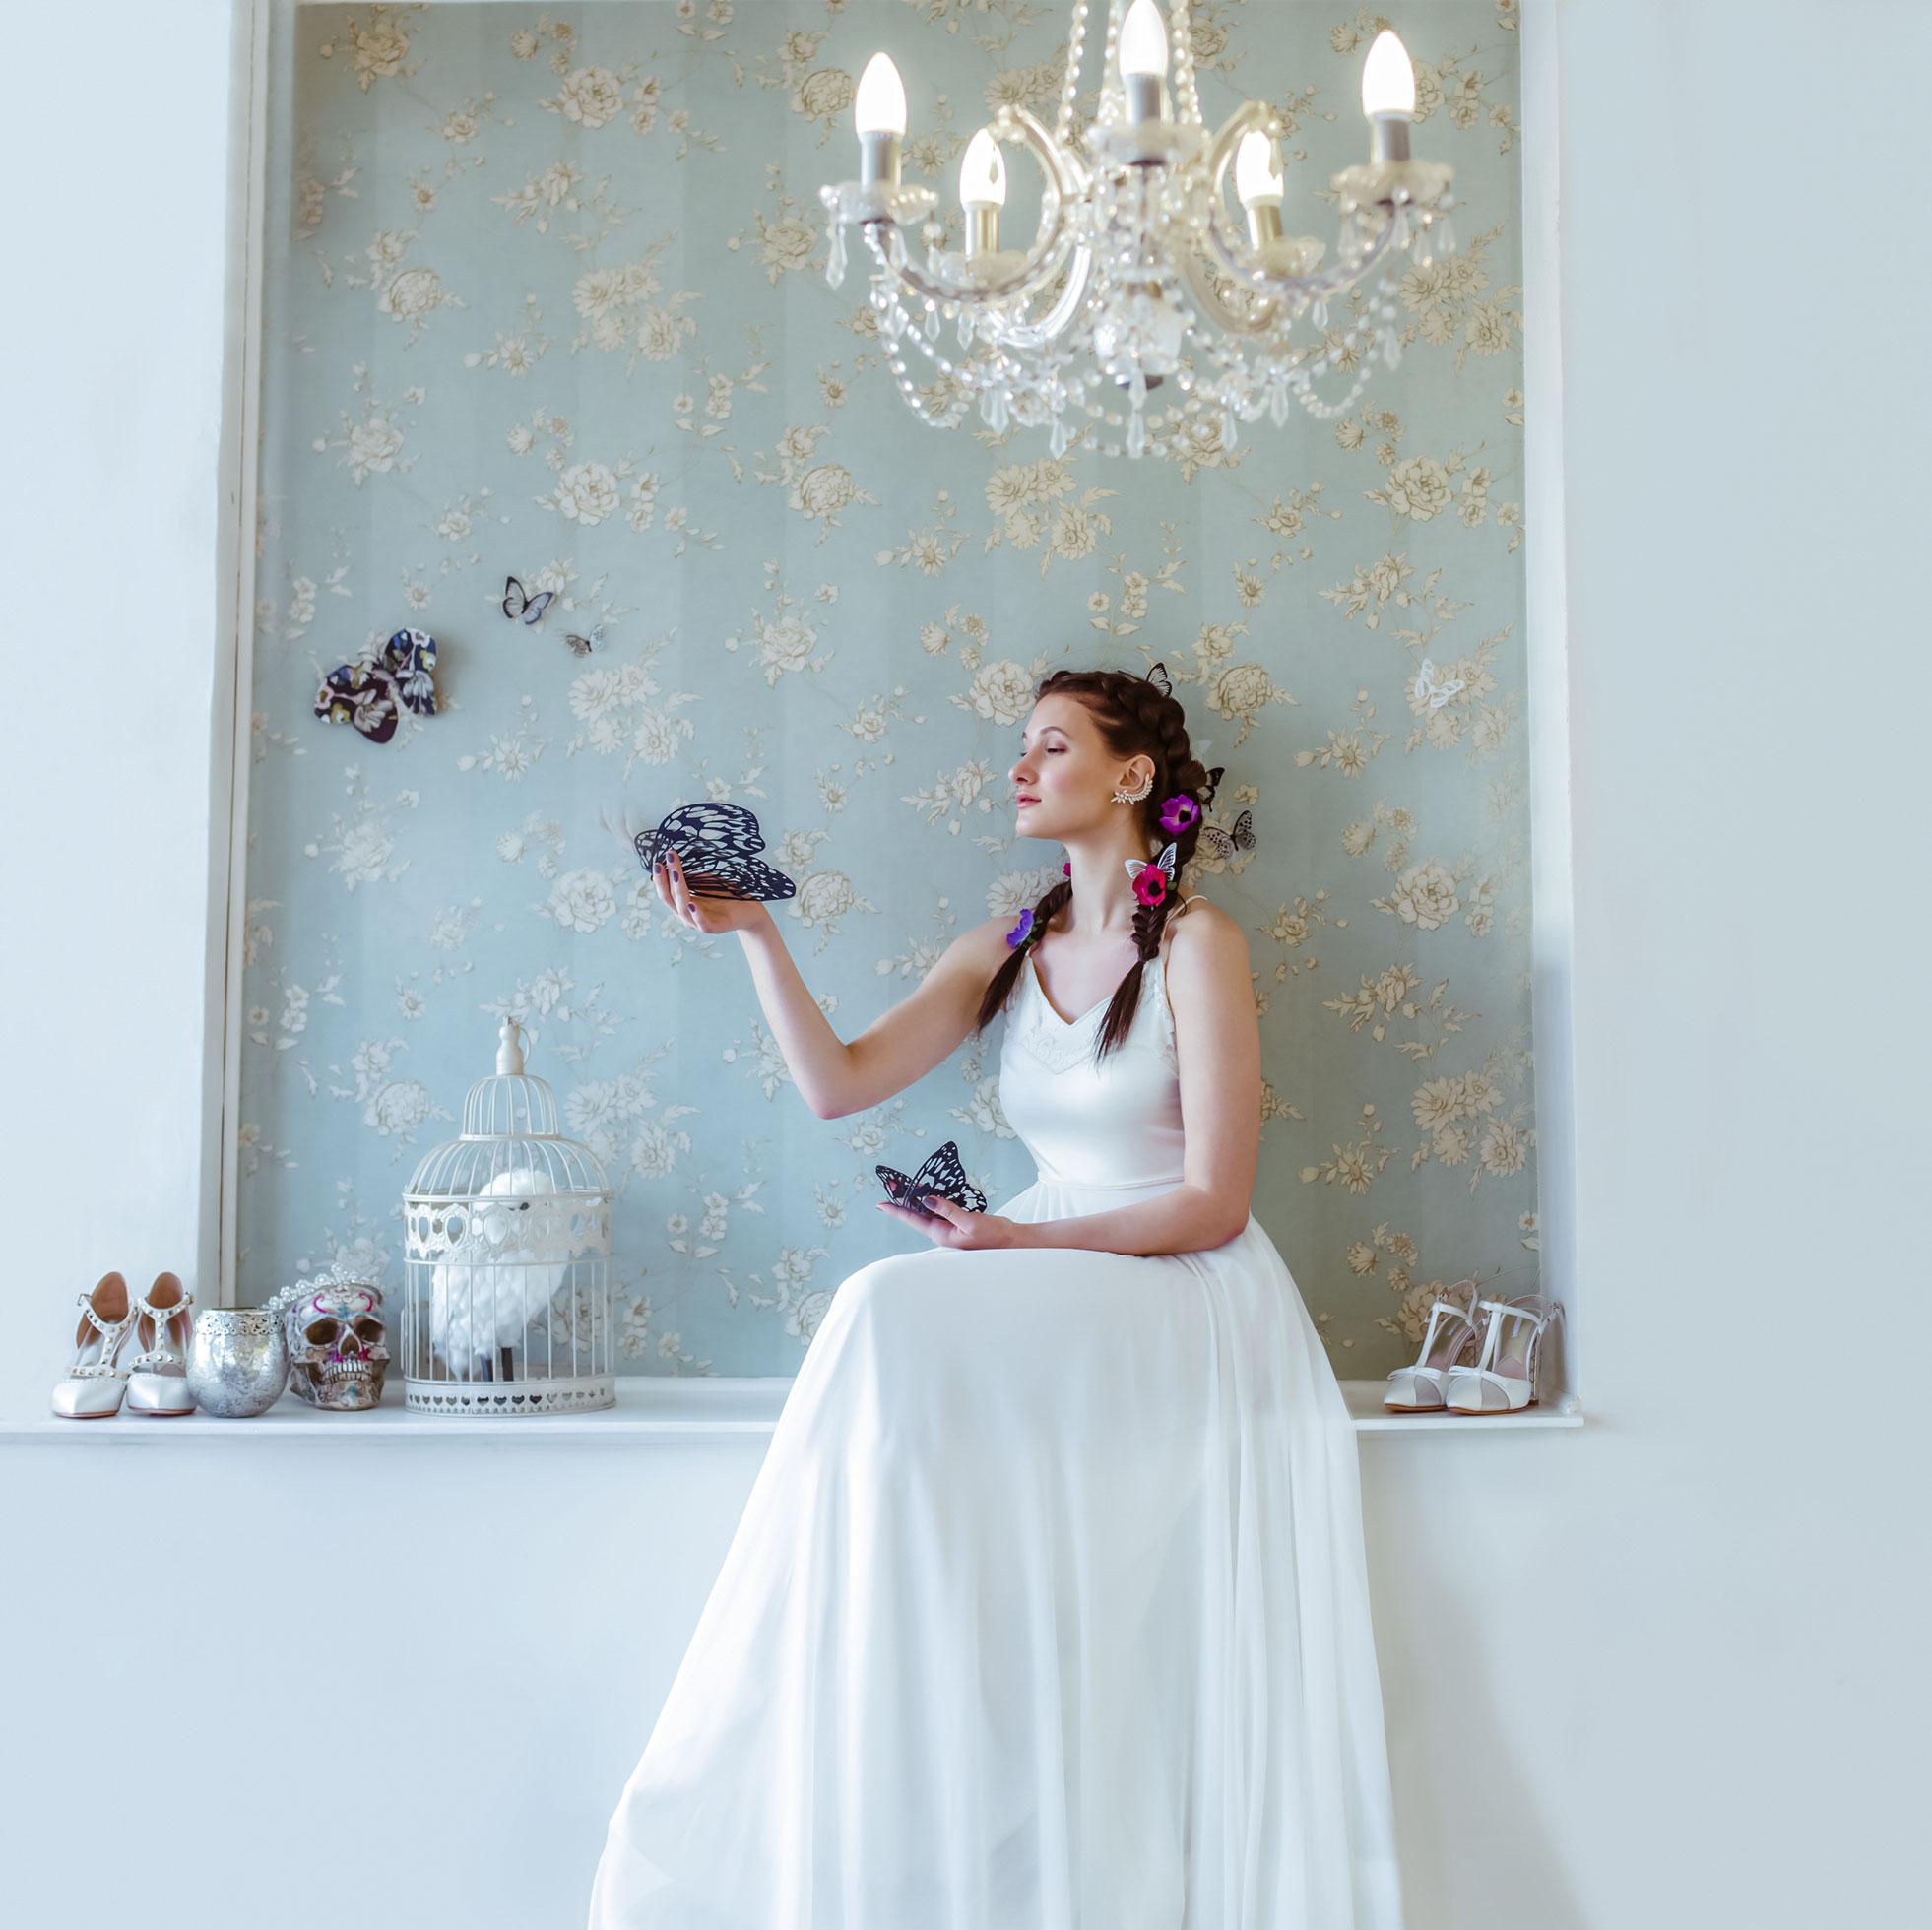 May & Grace Bridal - 3 alternative bridal looks 11 - butterflies